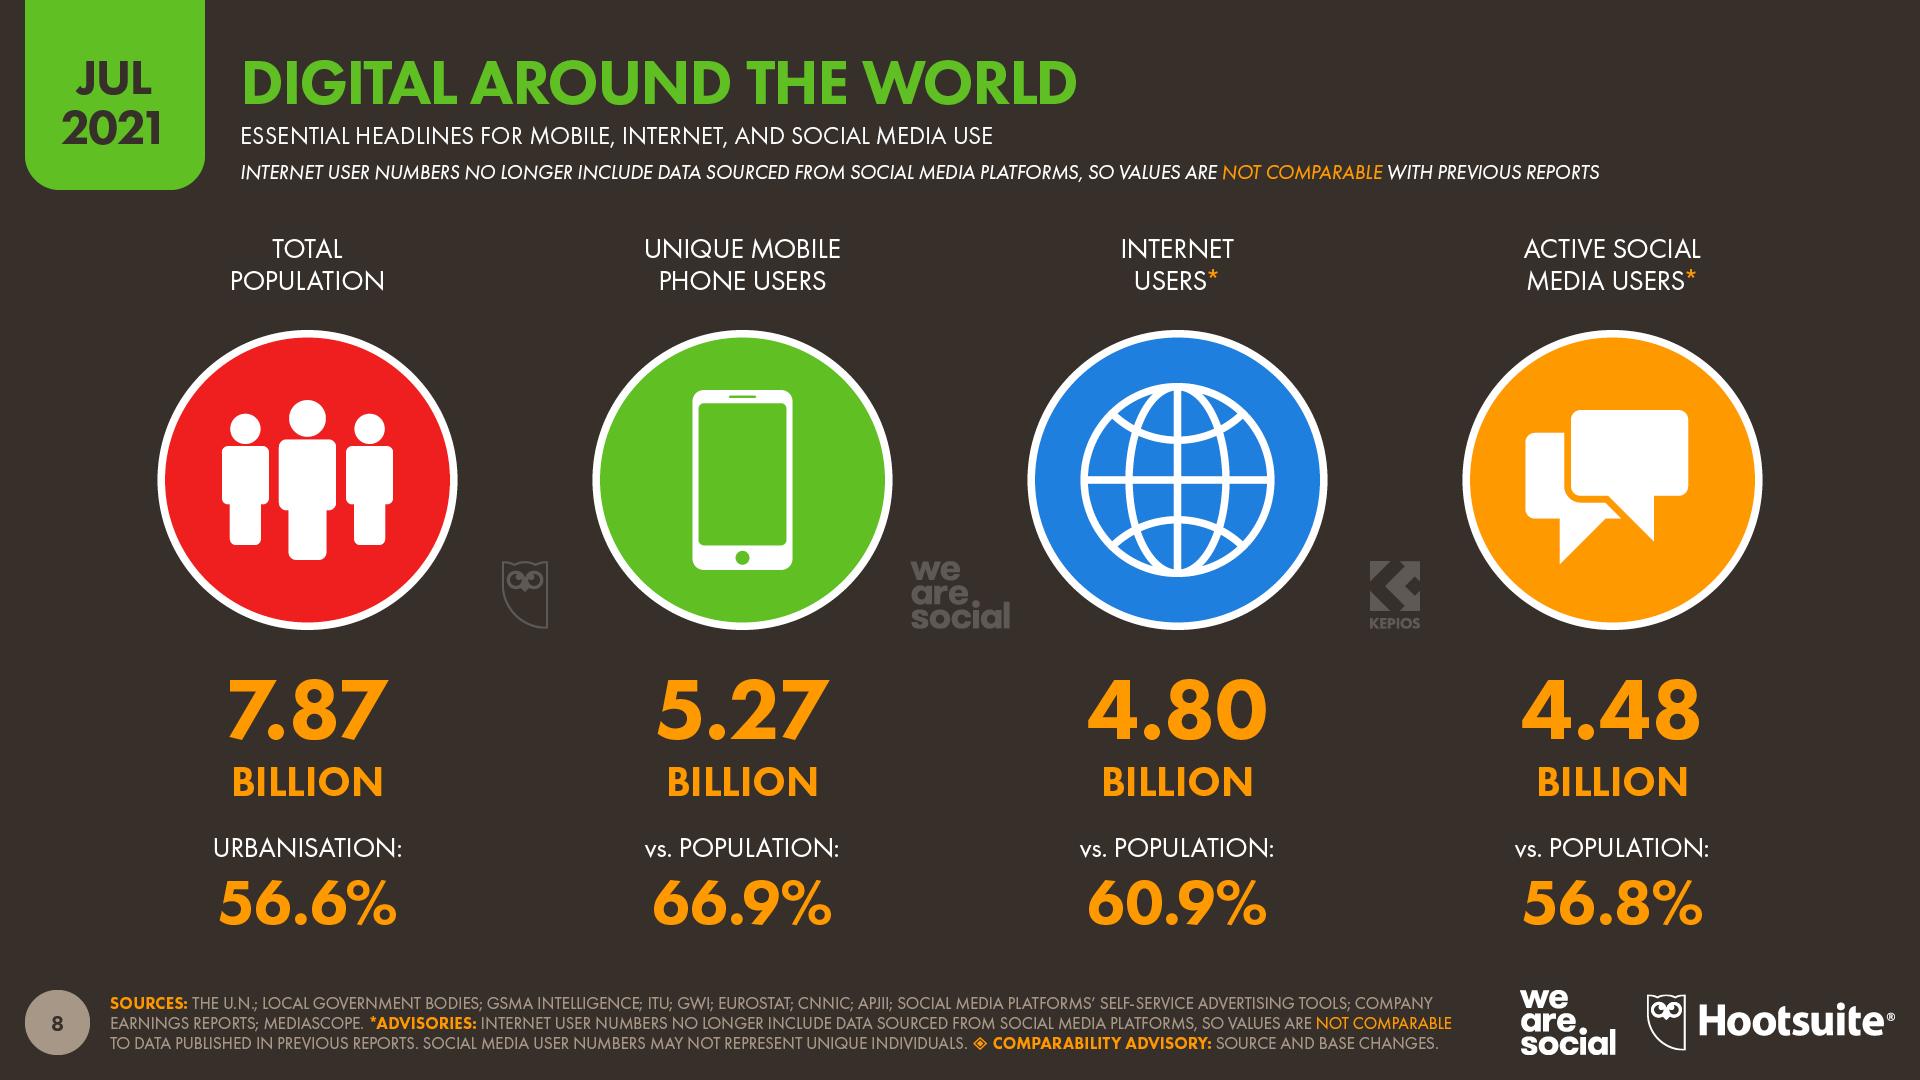 Global Digital Overview July 2021 DataReportal